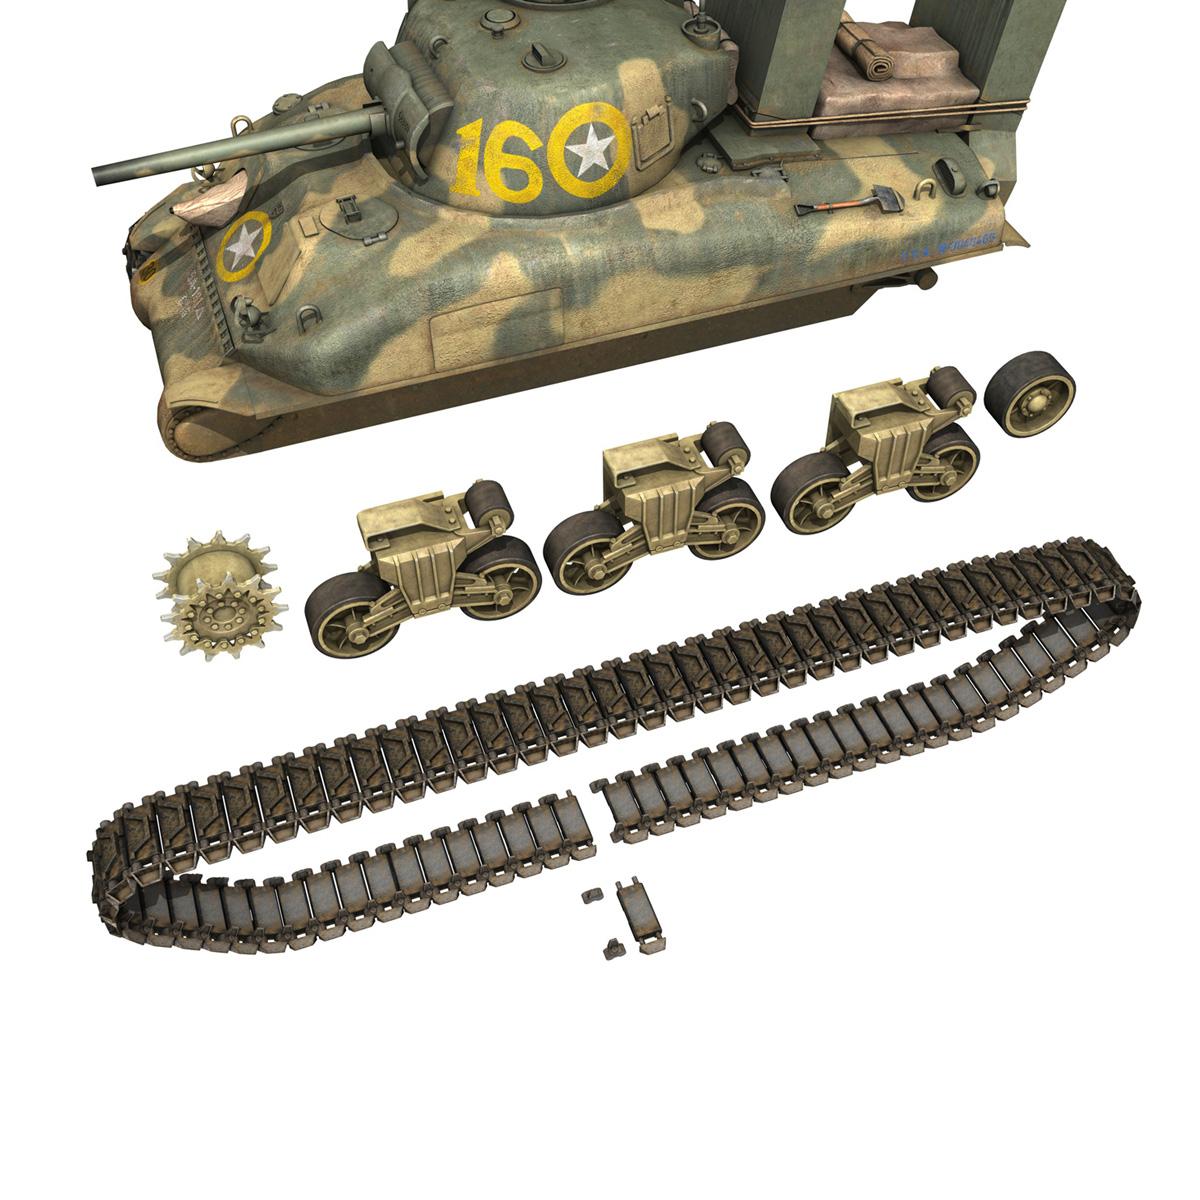 M4A1 Sherman - 16 3d model 3ds fbx c4d lwo lws lw obj 273059